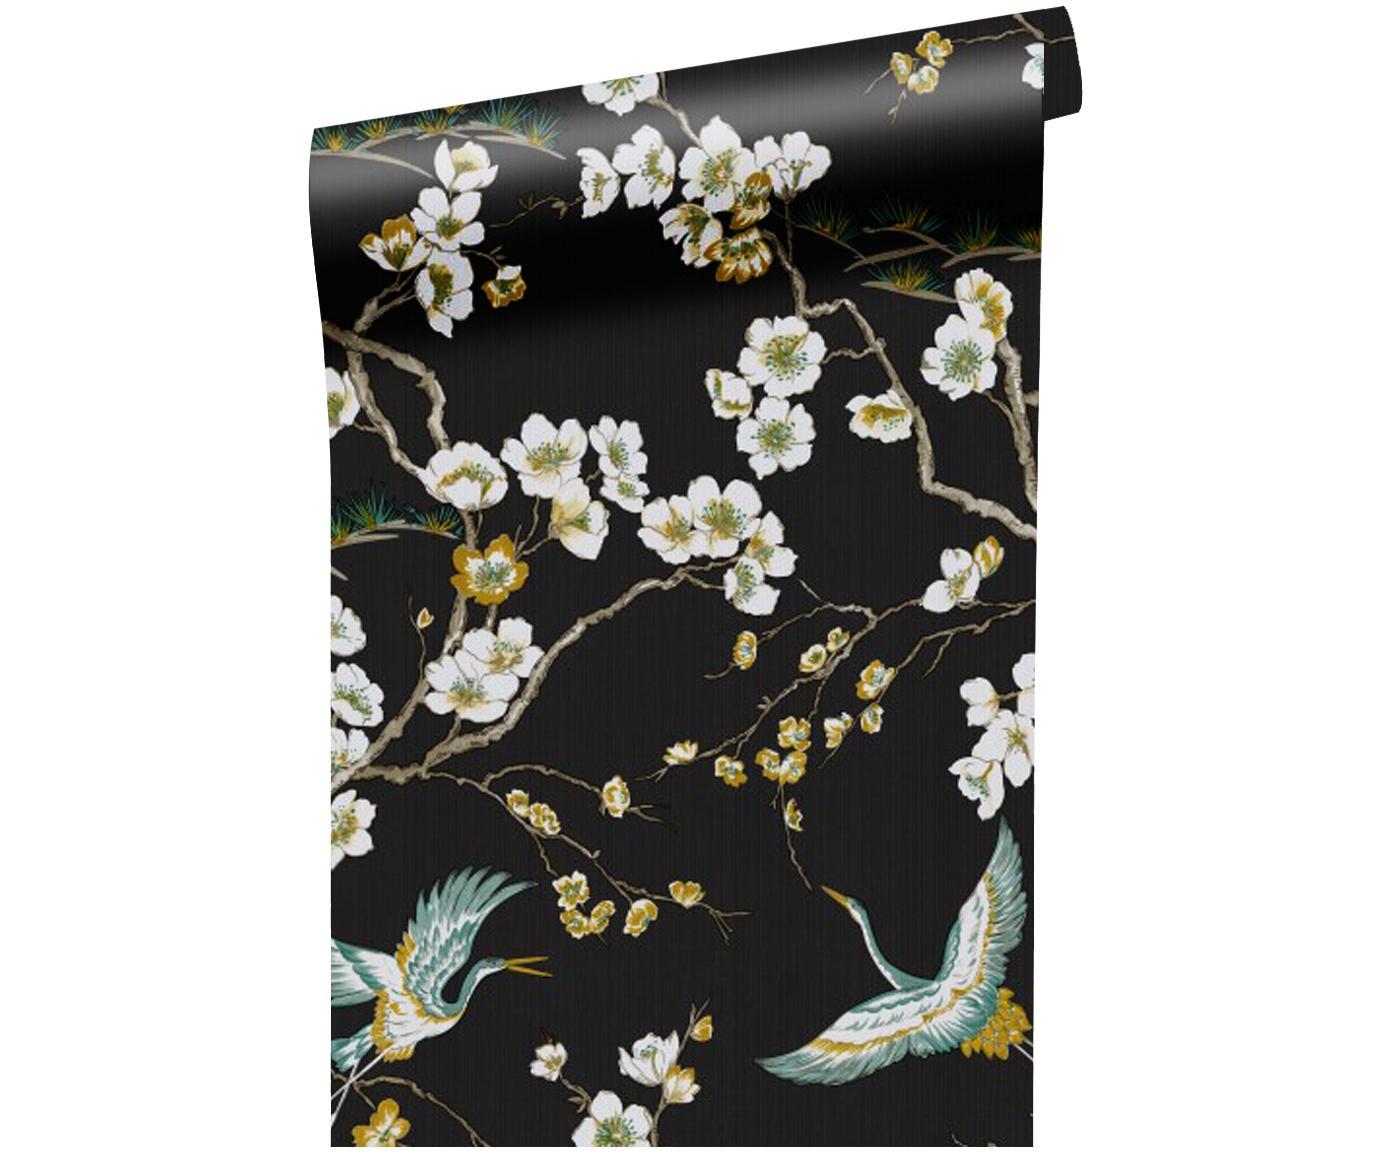 Carta da parati Japanese Flowers, Tessuto non tessuto, Nero, bianco, blu, giallo, Larg. 52 x Lung. 1005 cm